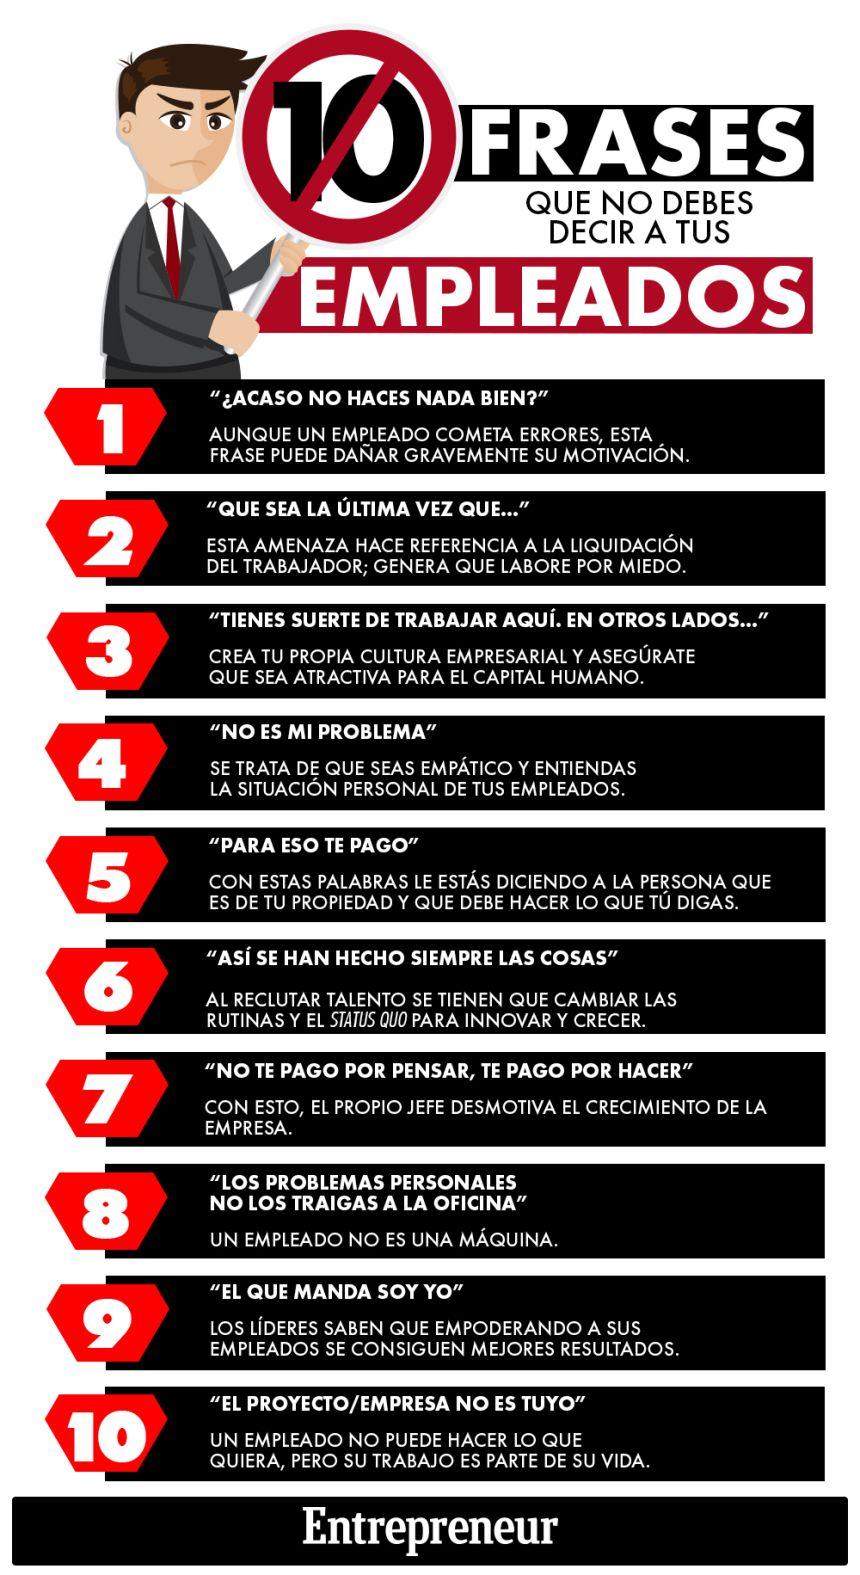 10 frases de un mal jefe #infografia #infographic #rrhh | Trabajo y ...